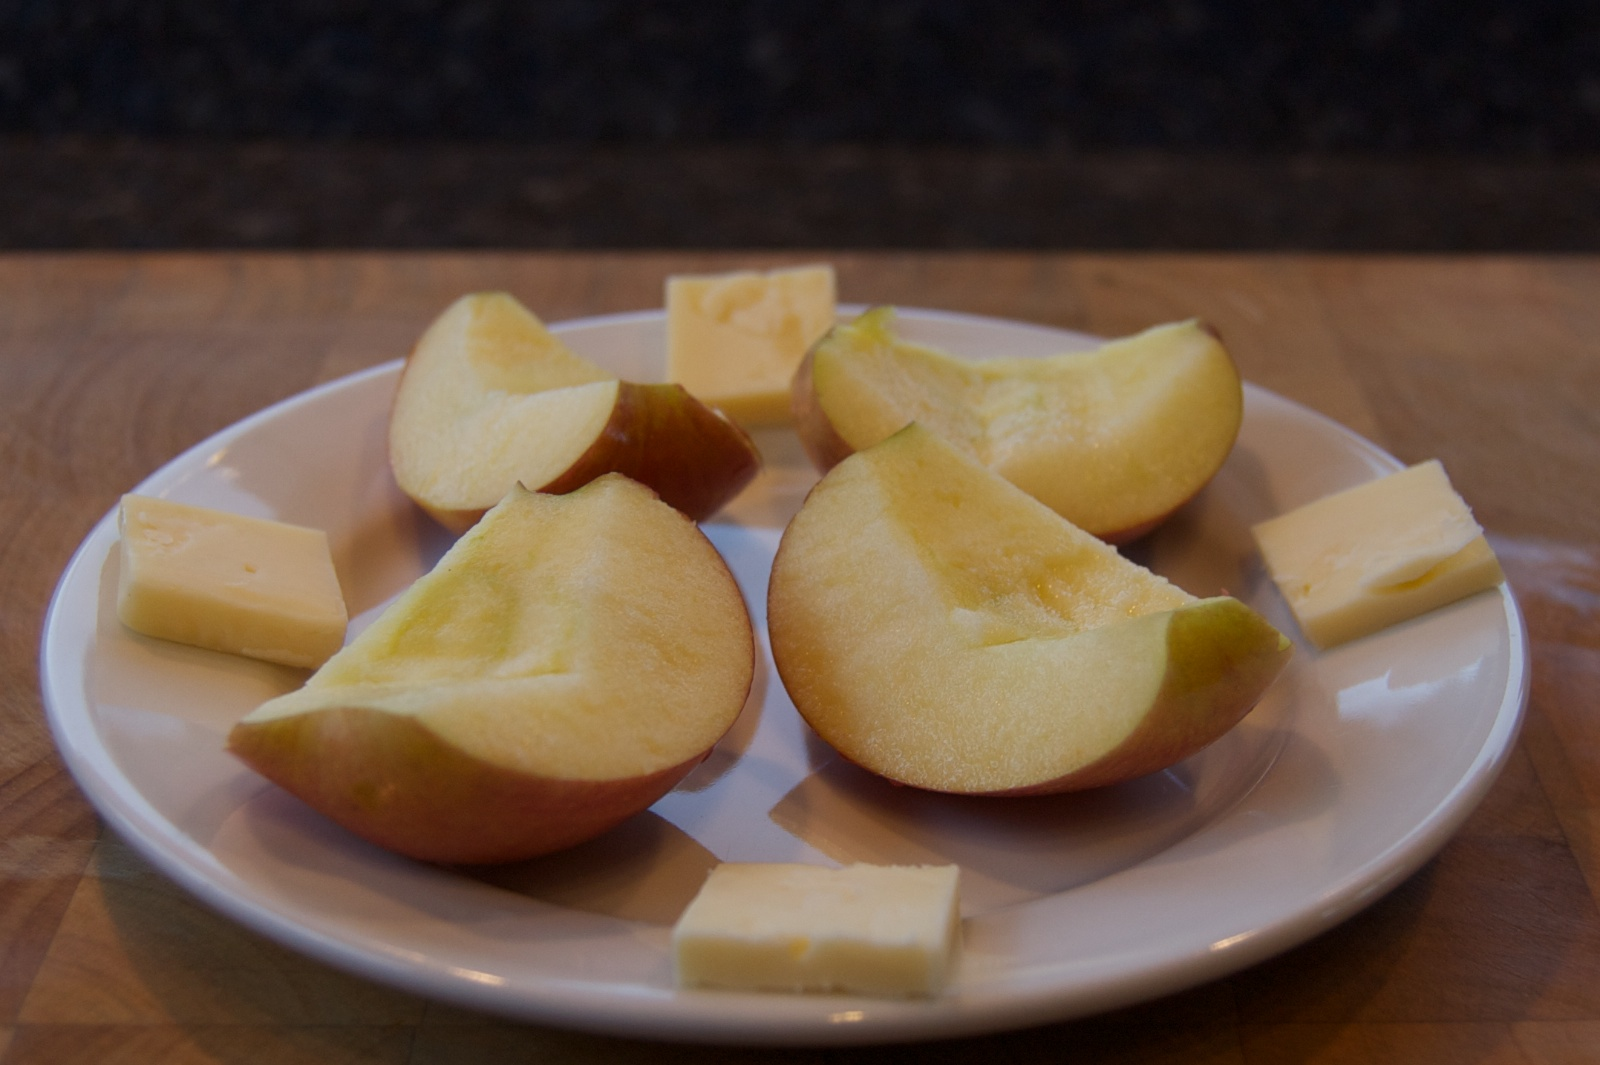 http://blog.rickk.com/food/2013/12/21/ate.2013.12.20.s.jpg